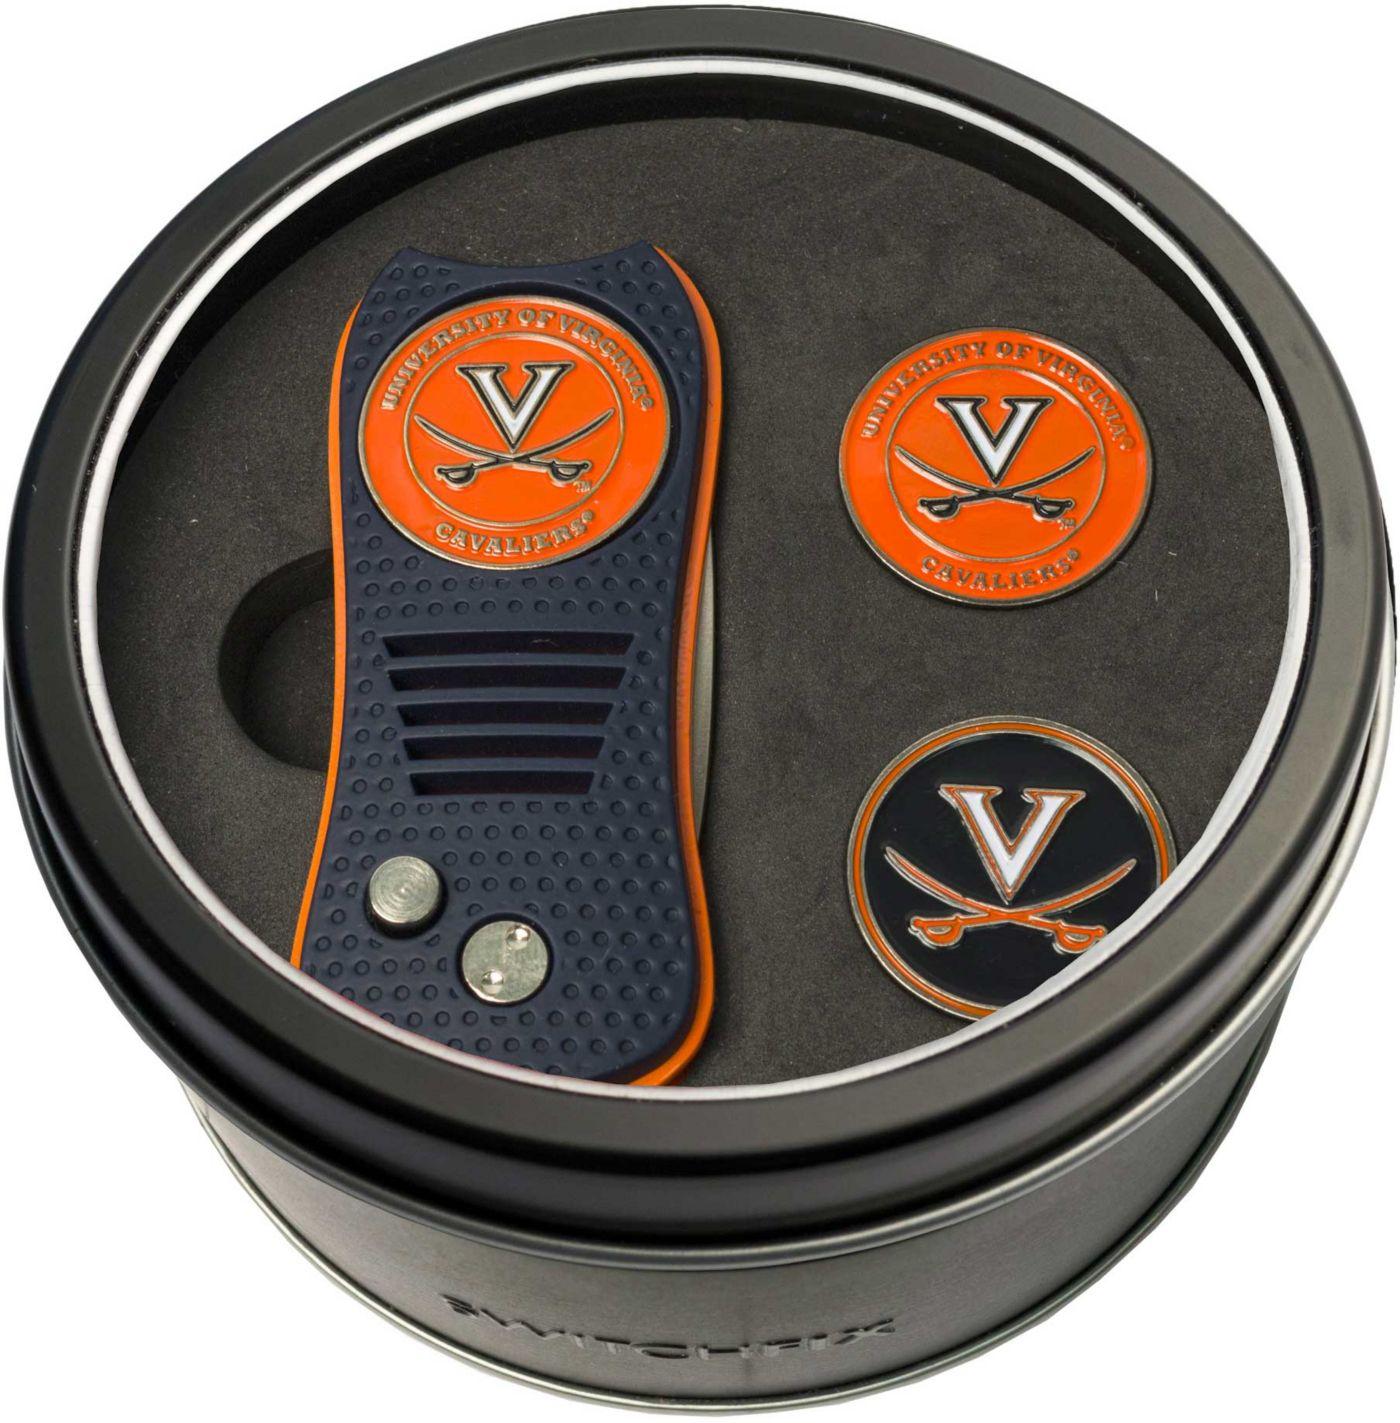 Team Golf Virginia Cavaliers Switchfix Divot Tool and Ball Markers Set